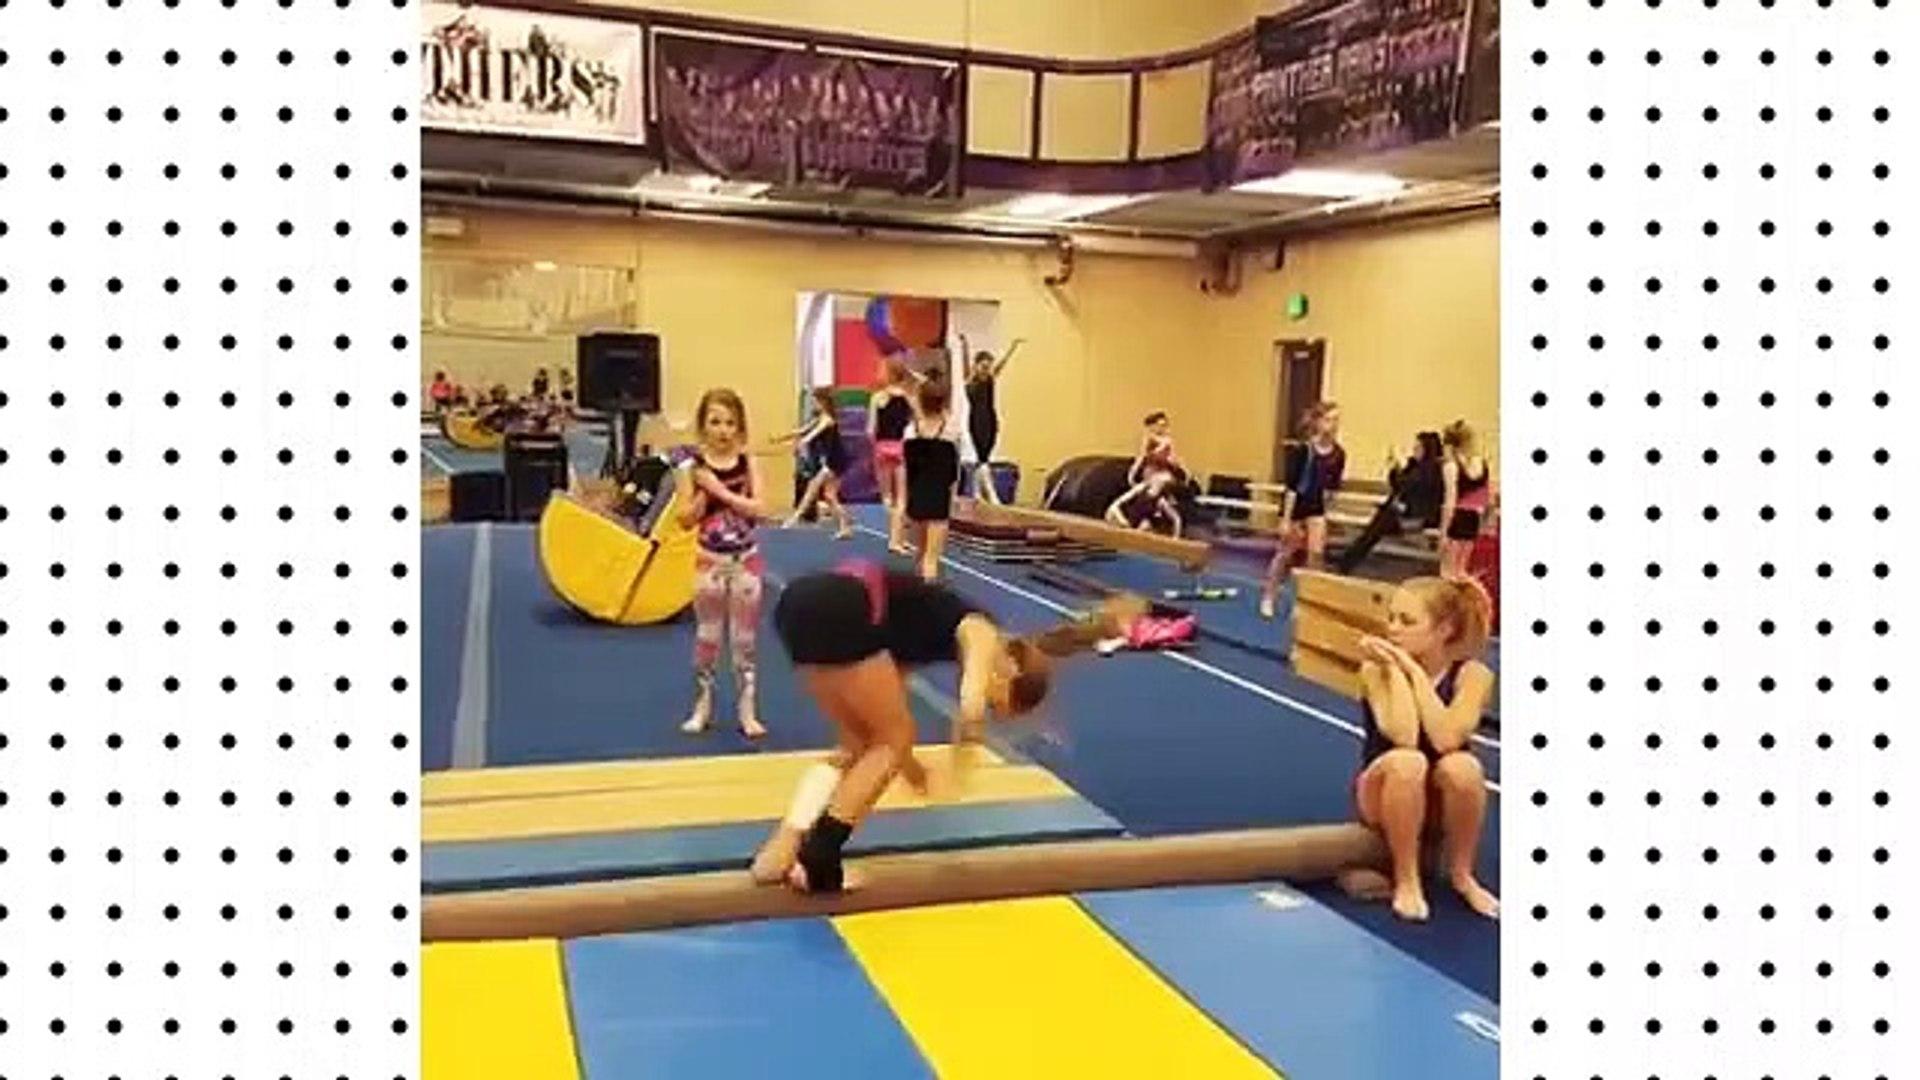 Funniest Kid Gymnastics Fails Compilation! 2019 Videos Viral TRND